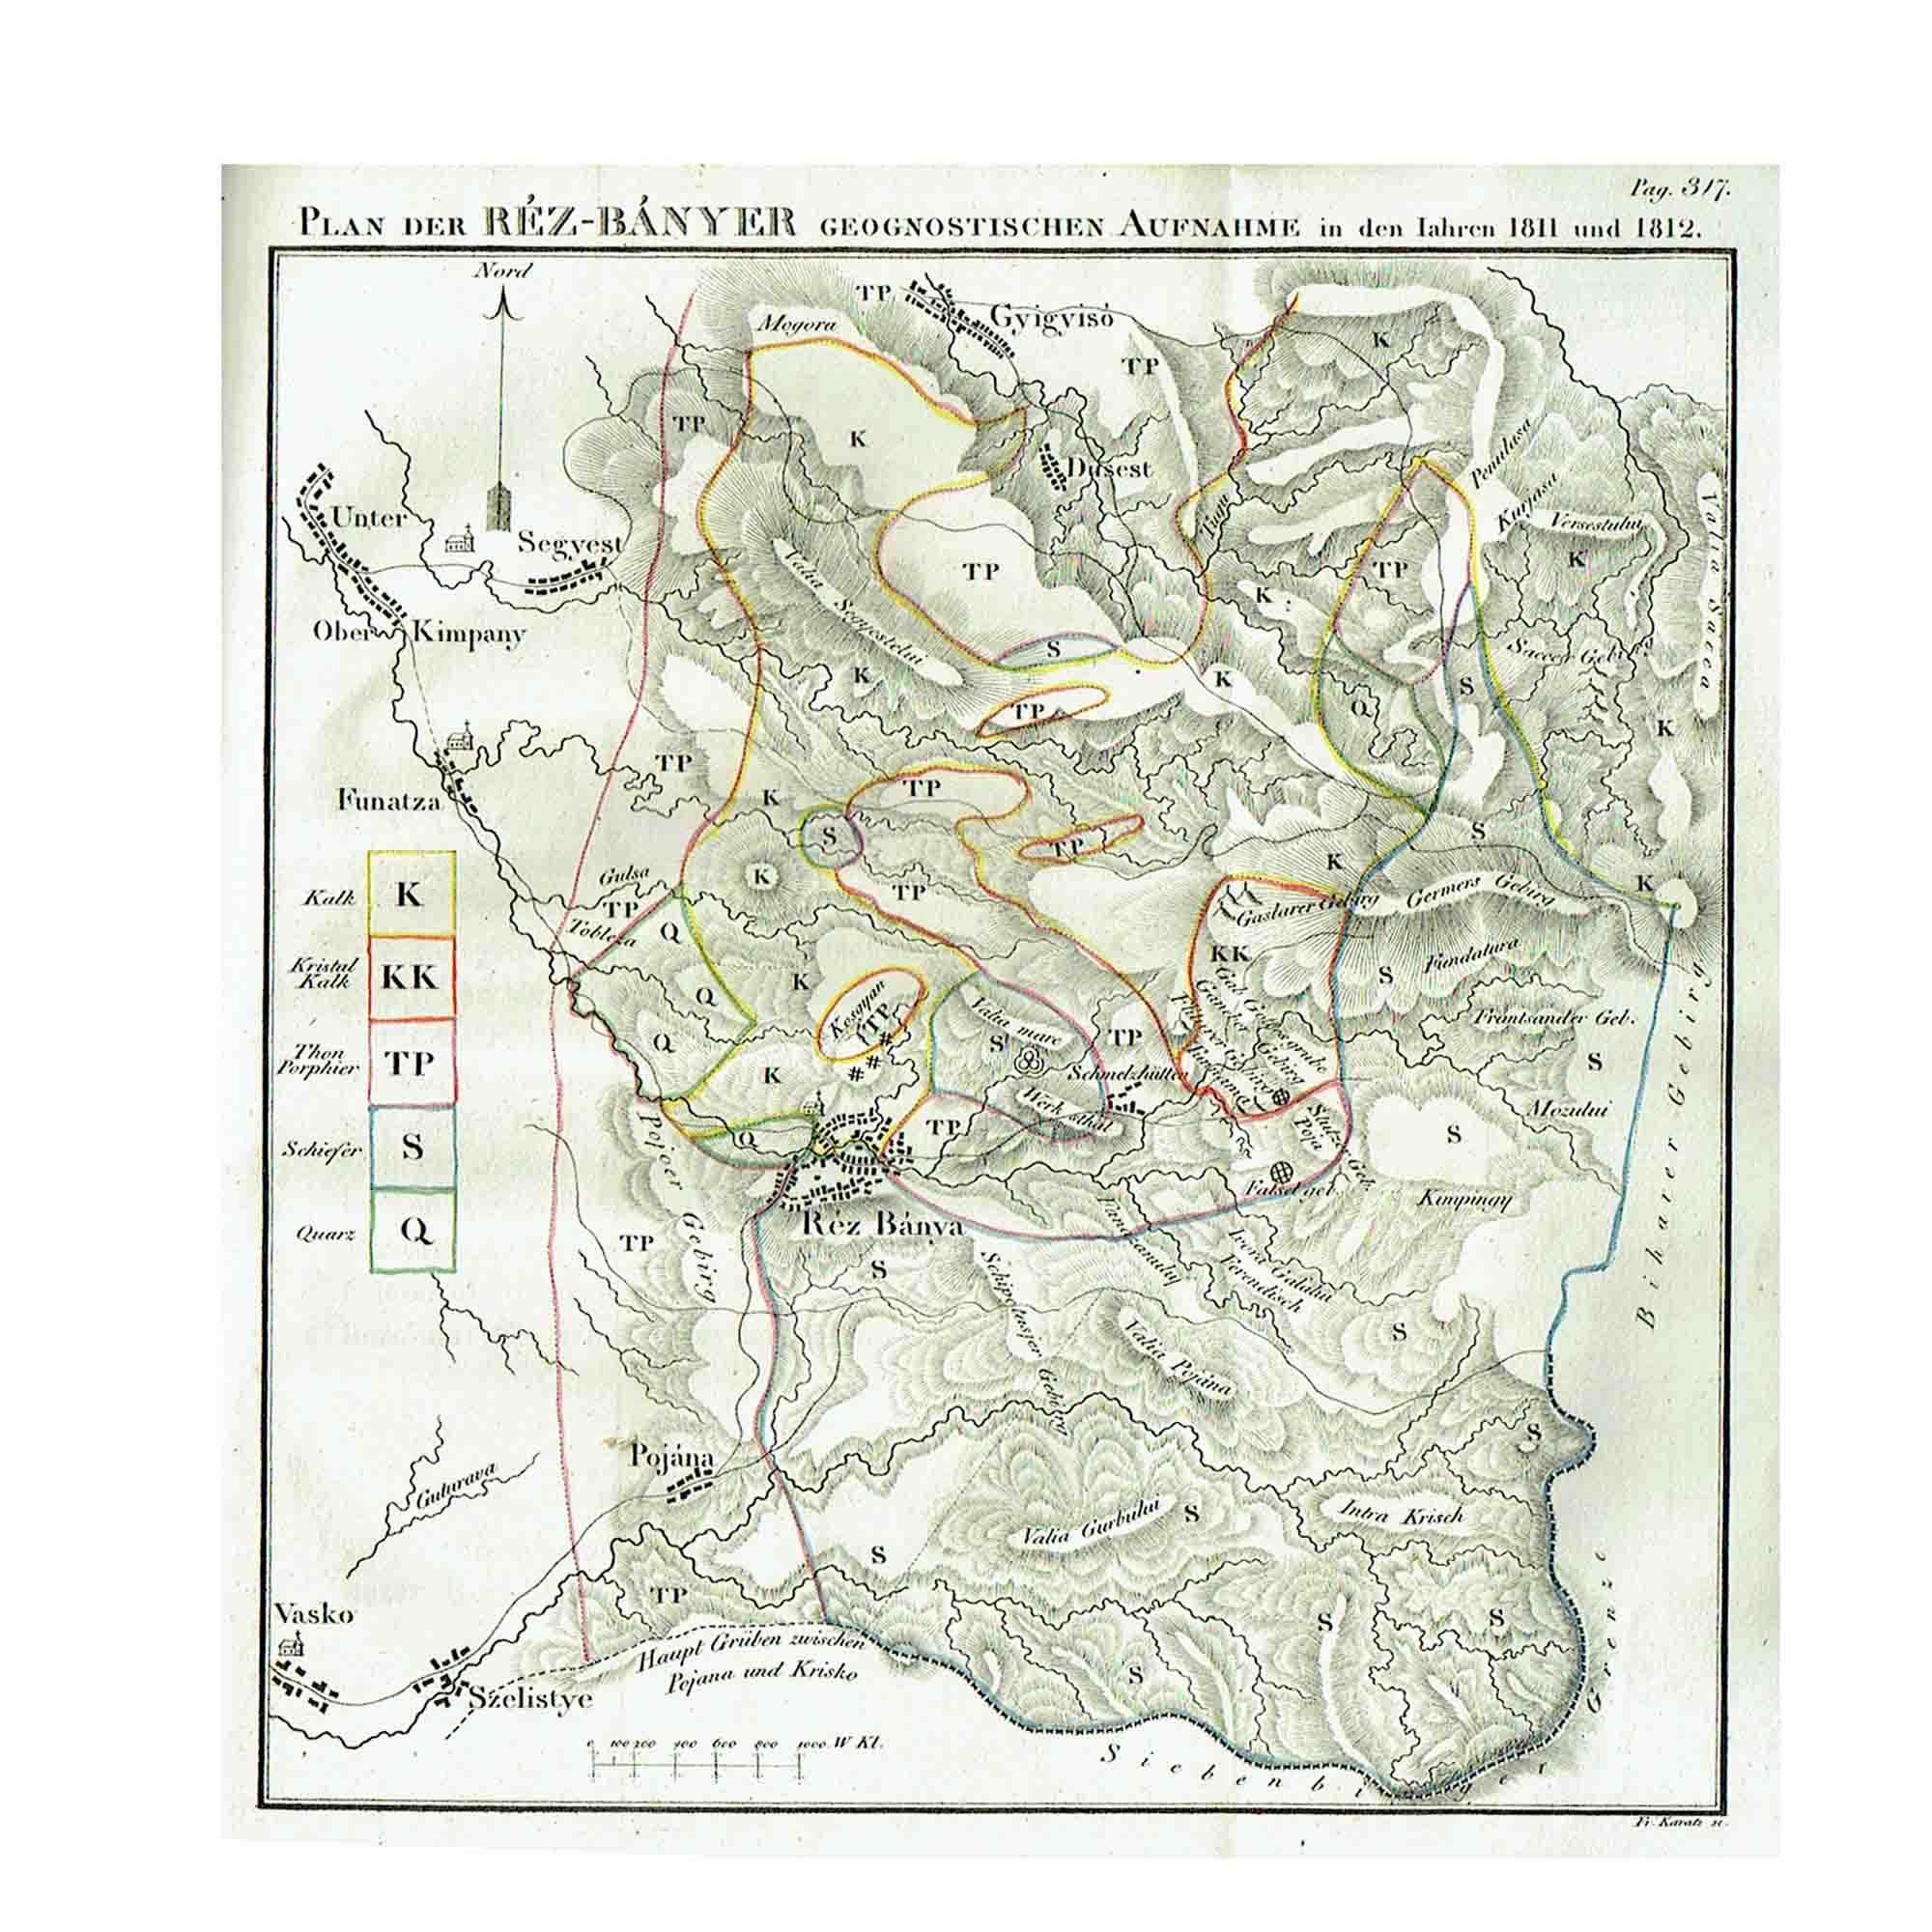 5451-Acta-Musei-Hungarici-1818-Karte-N.jpg